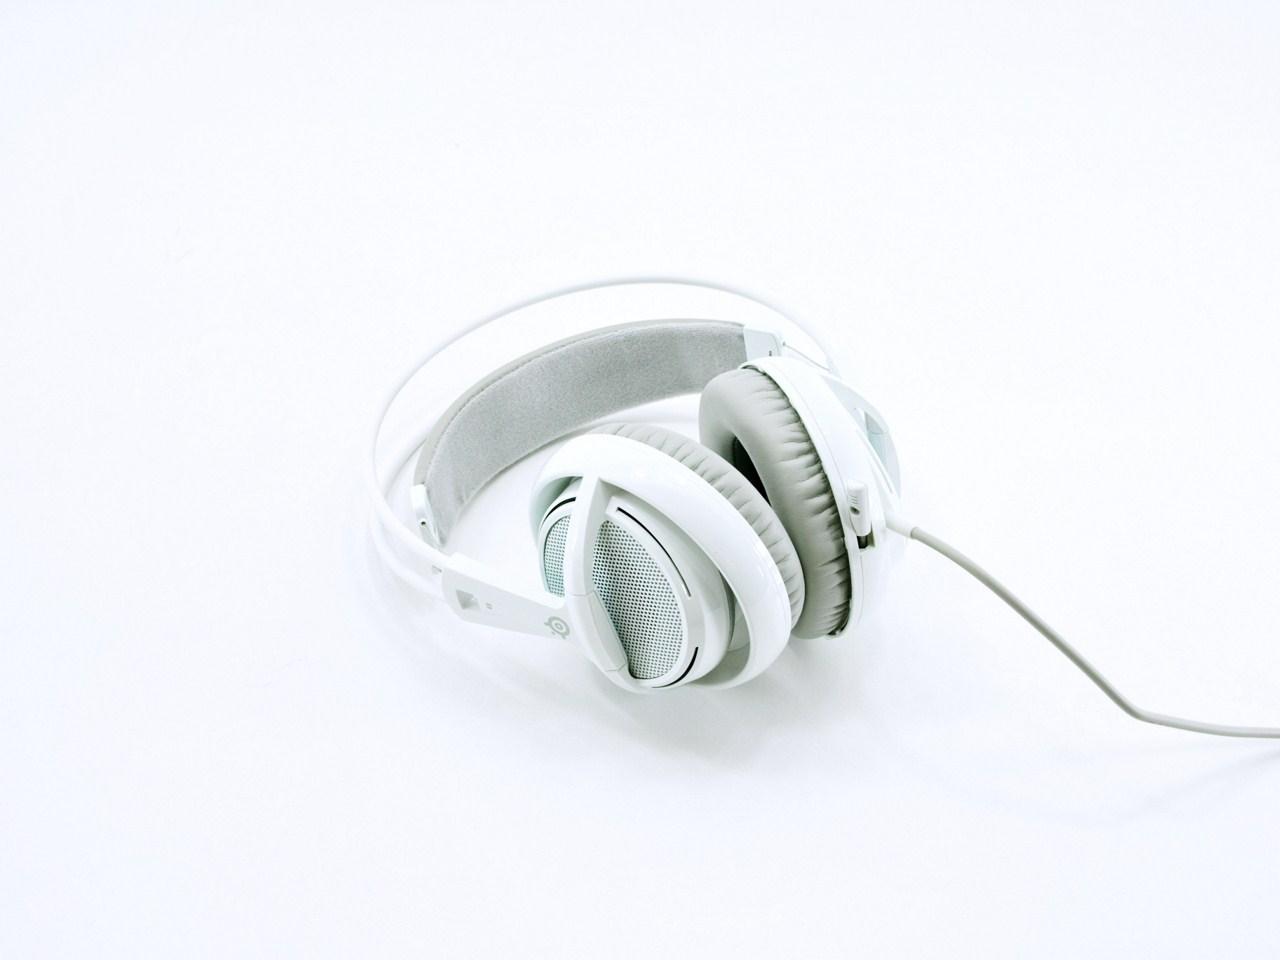 SteelSeries Siberia V2 Frost Blue USB Headset Review